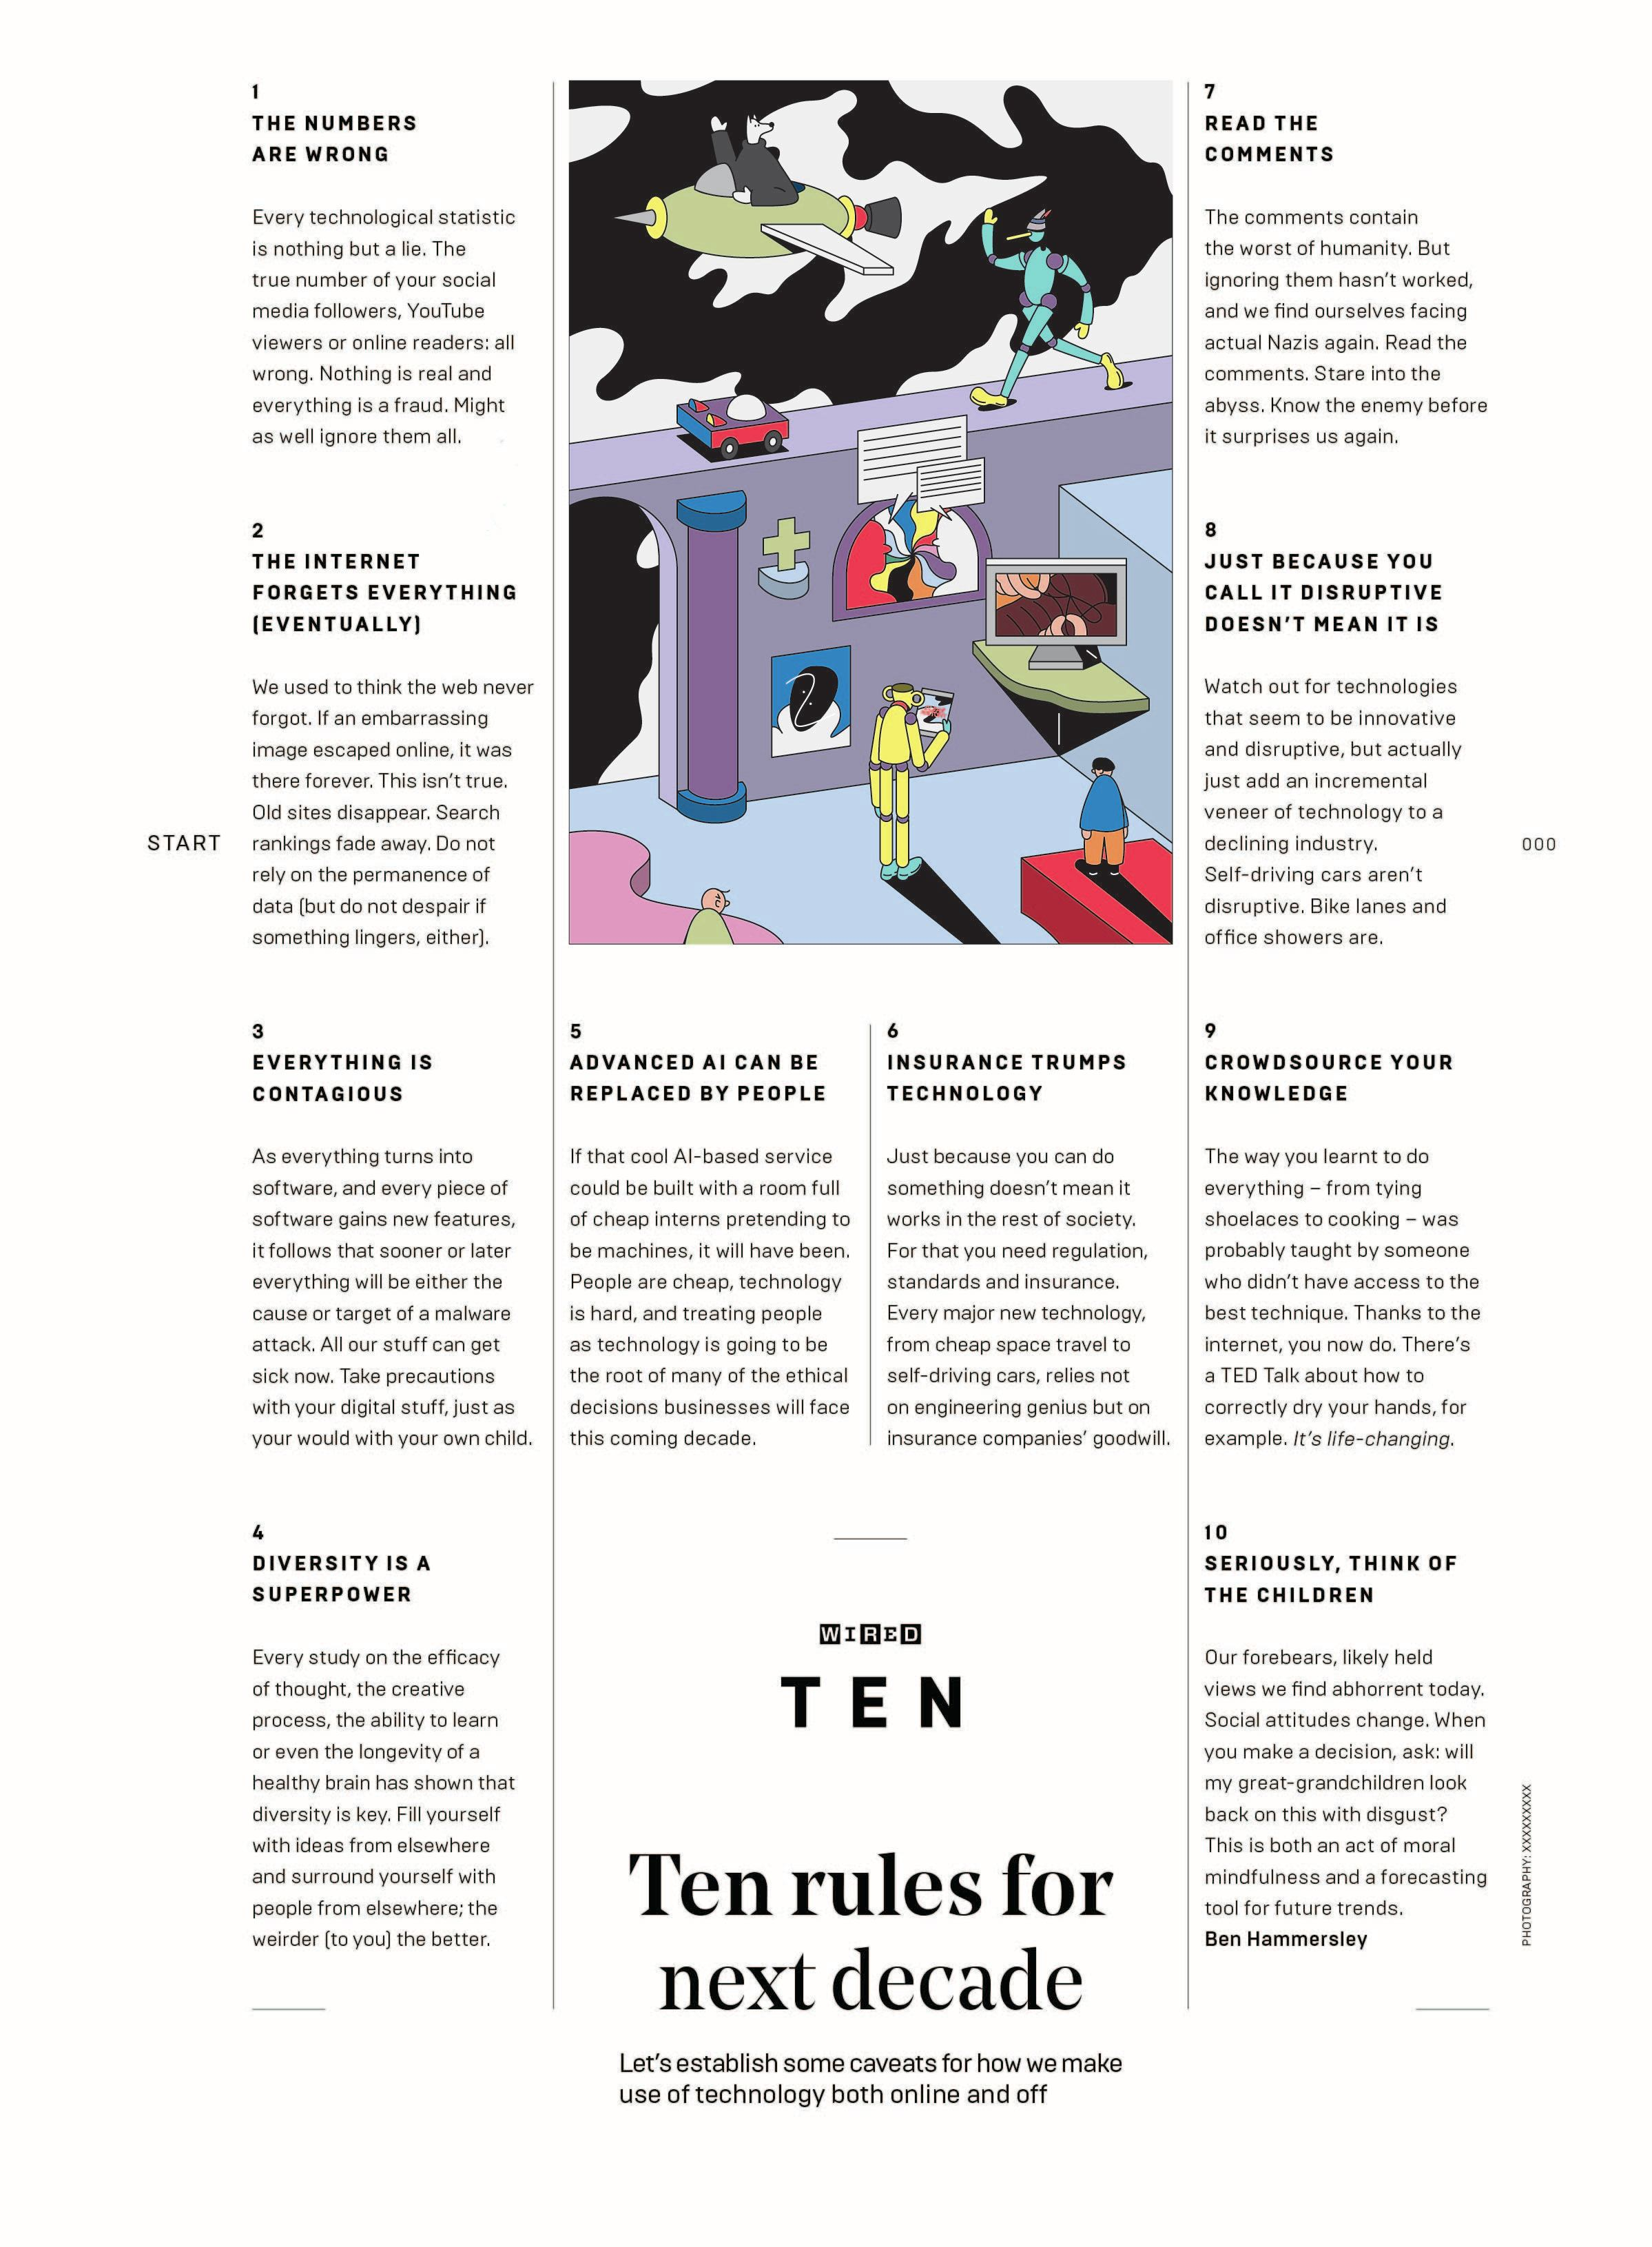 10 Rules